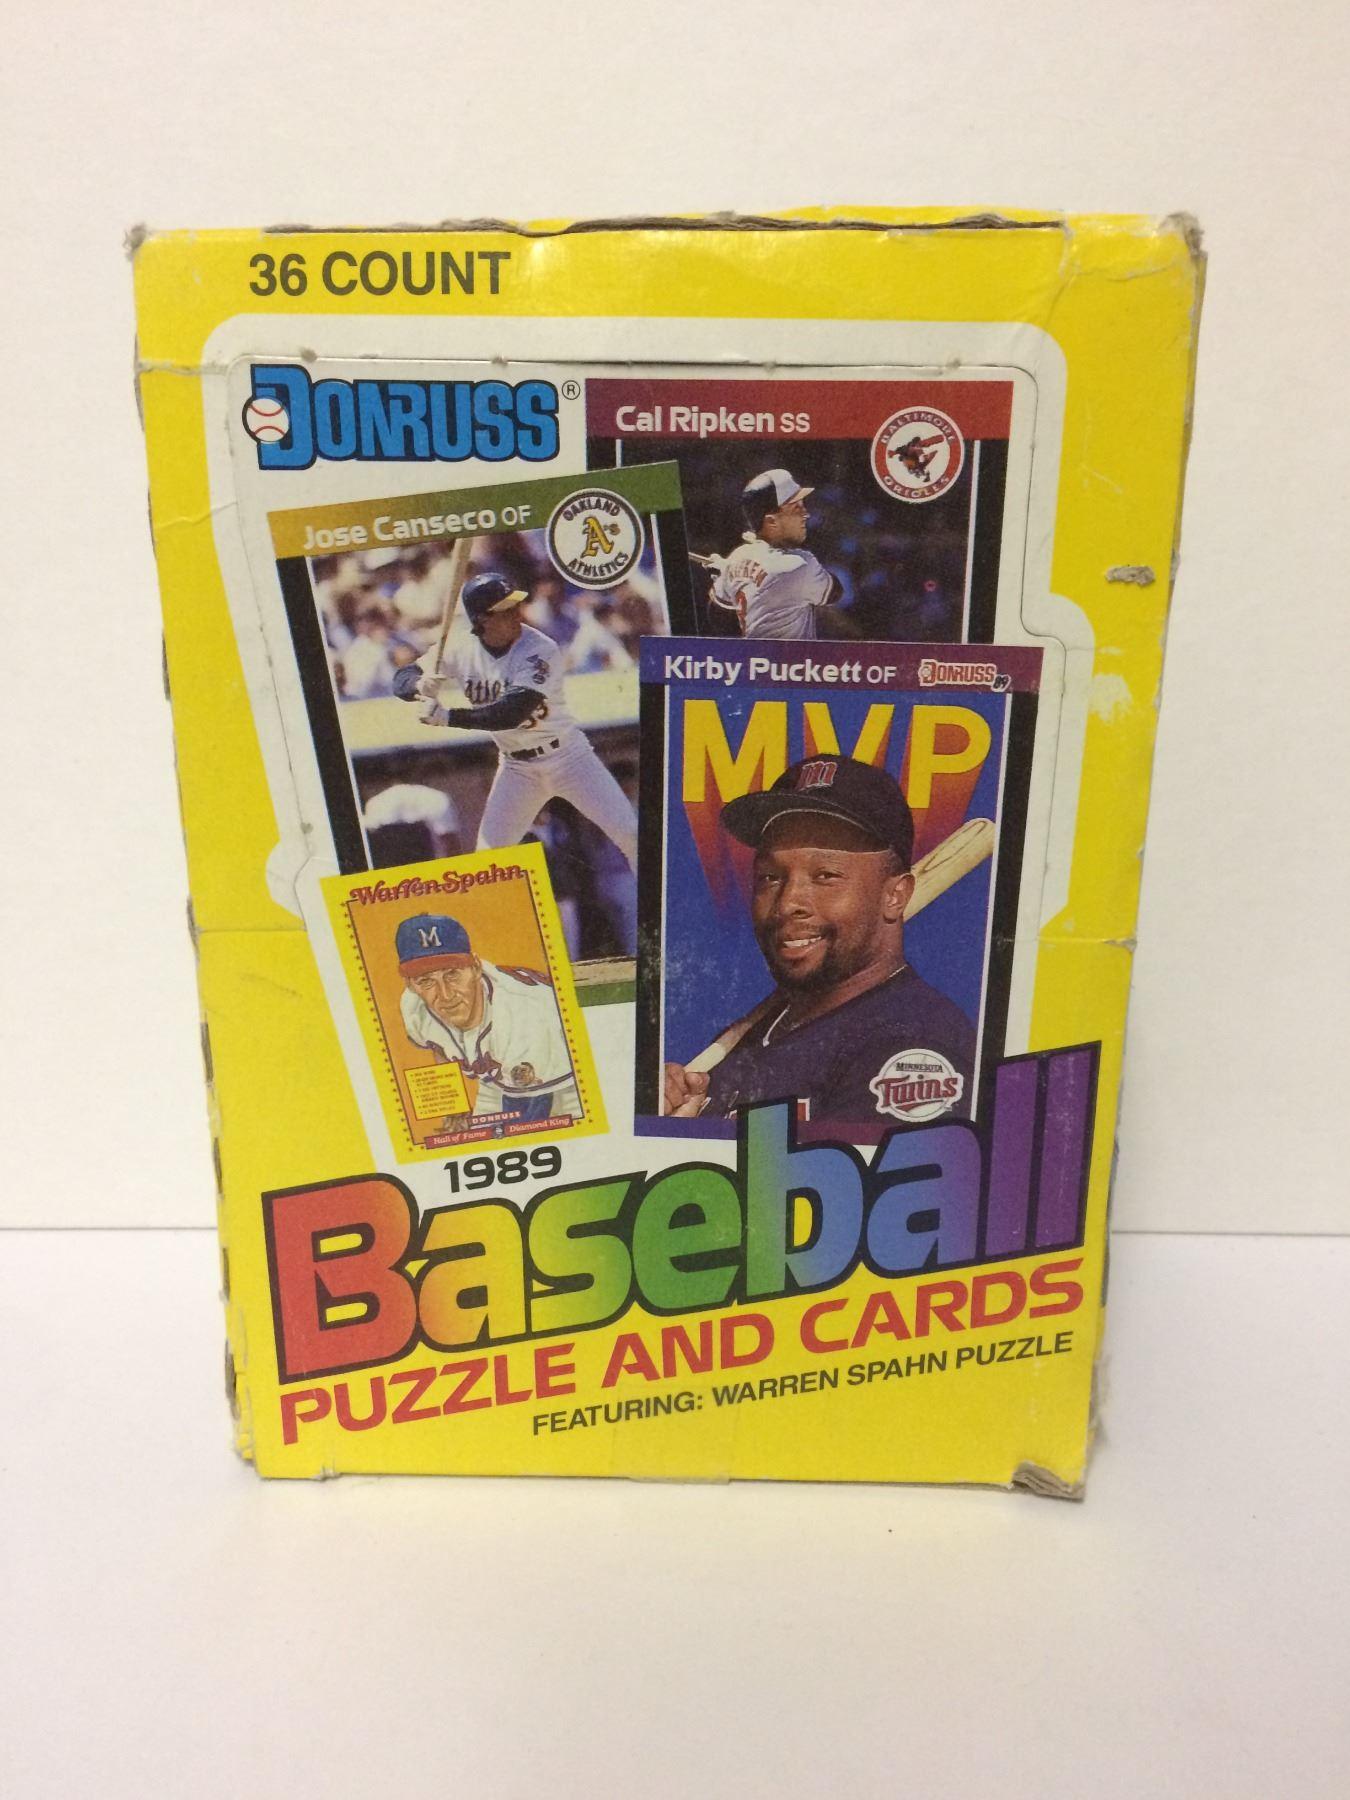 1989 Donruss Baseball Puzzle Cards Set Featuring Warren Spahn Puzzle